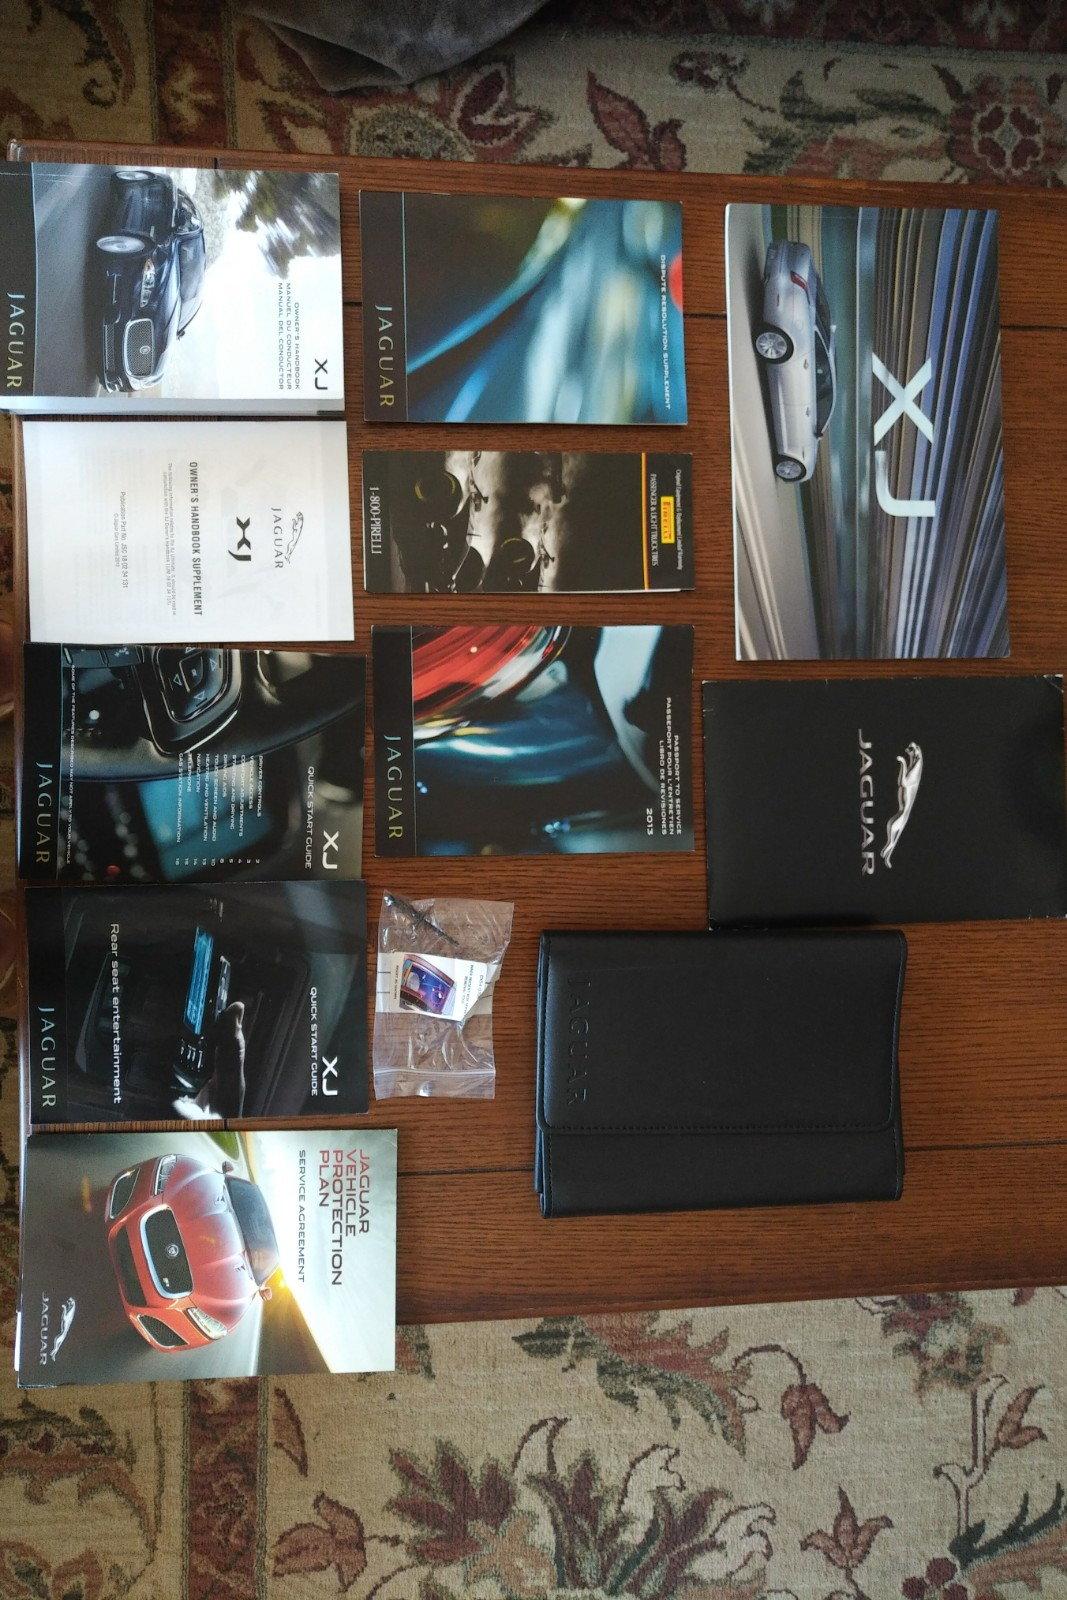 2013 Jaguar XJL Ultimate - 1 of 30 - 36,989 miles ...